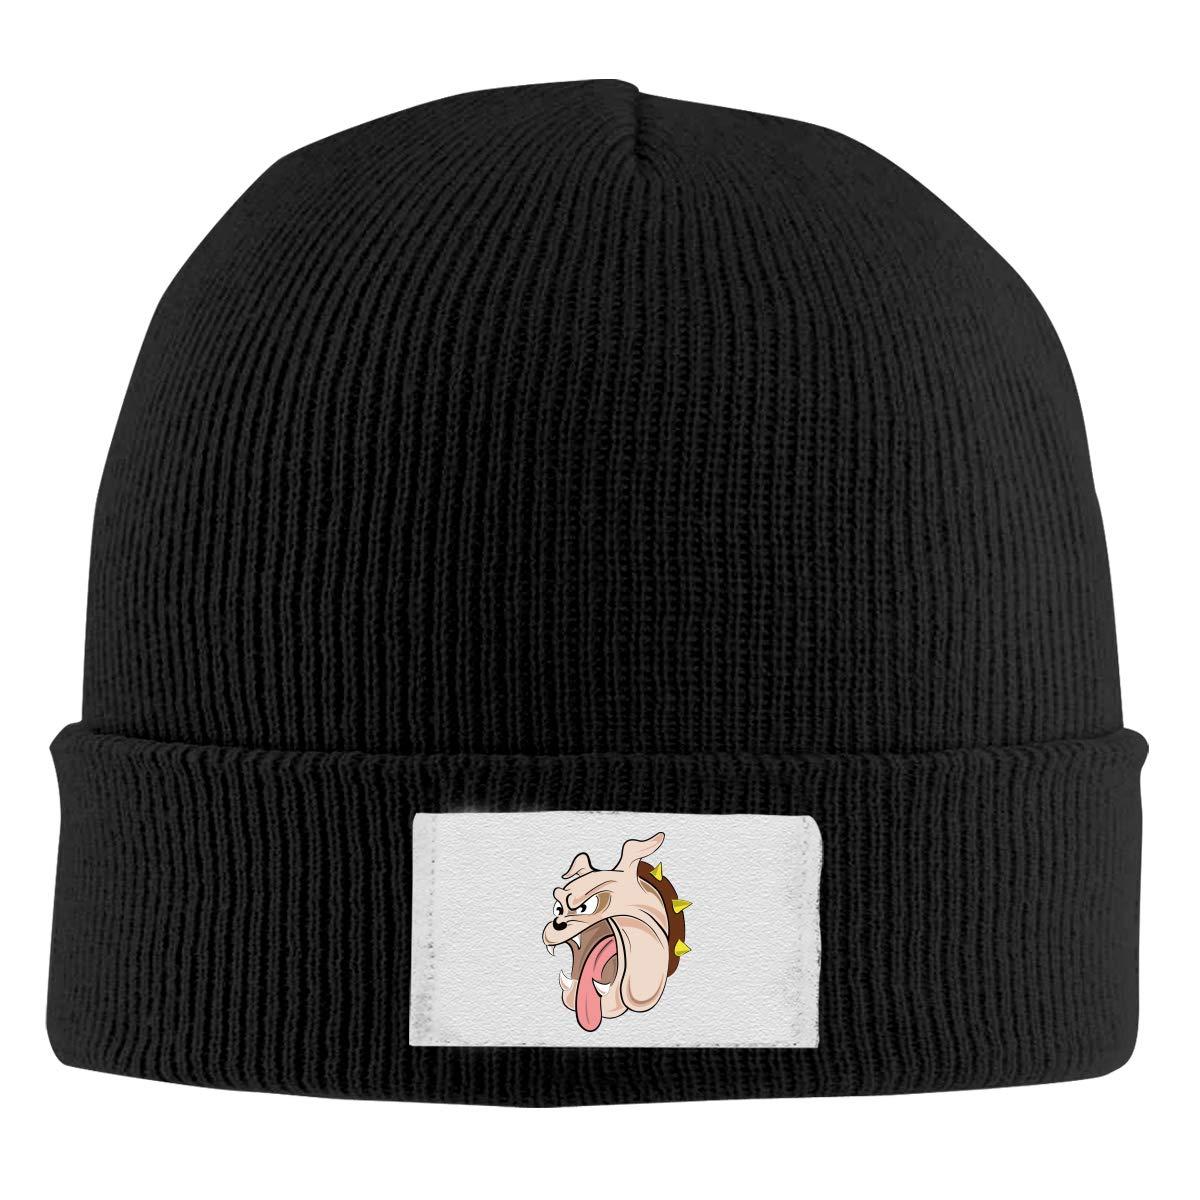 Dunpaiaa Skull Caps Fierce Pug Winter Warm Knit Hats Stretchy Cuff Beanie Hat Black